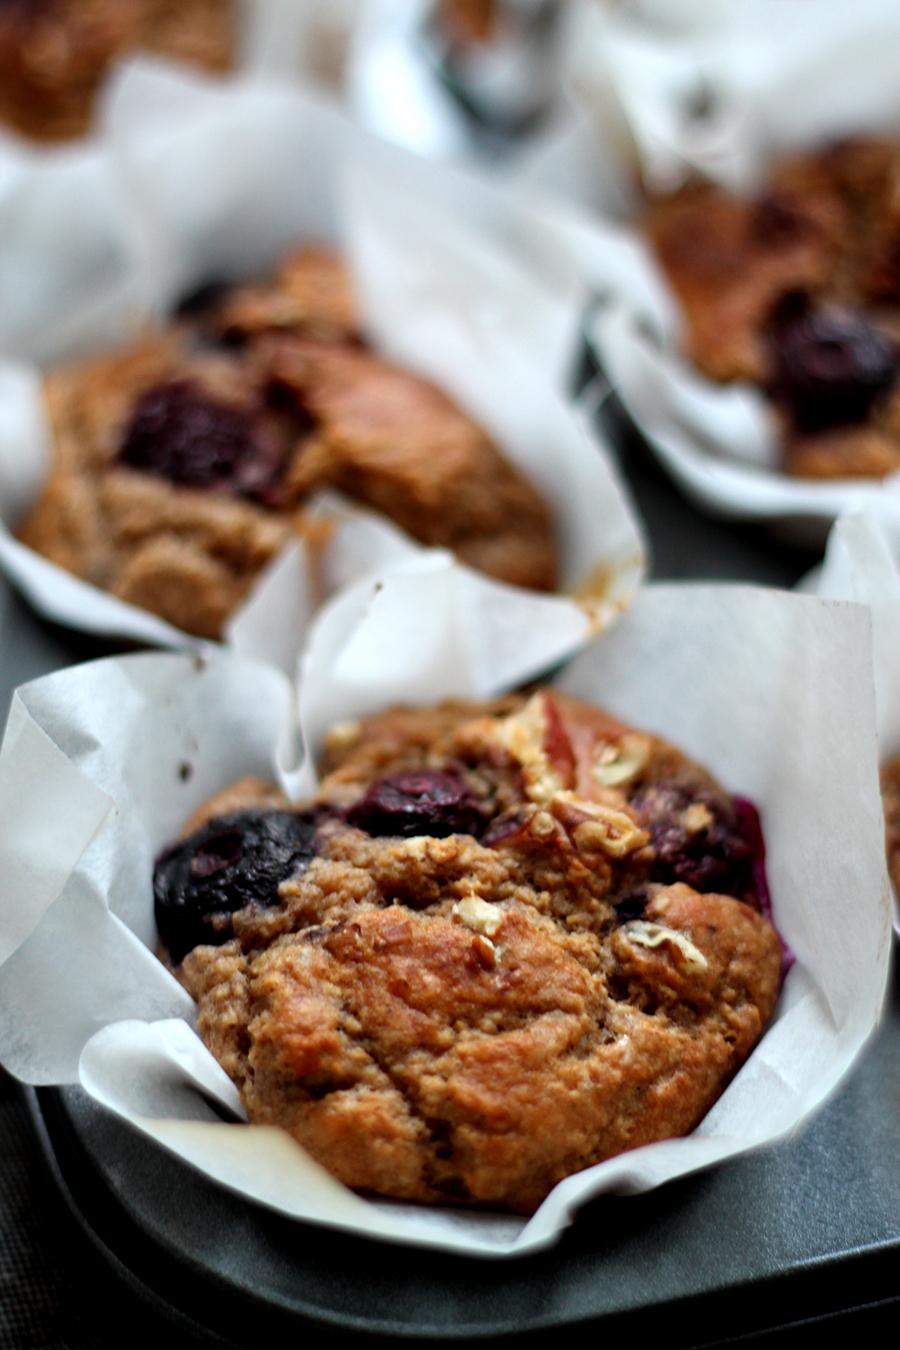 Gezonde ontbijtmuffins met havermout en fruit